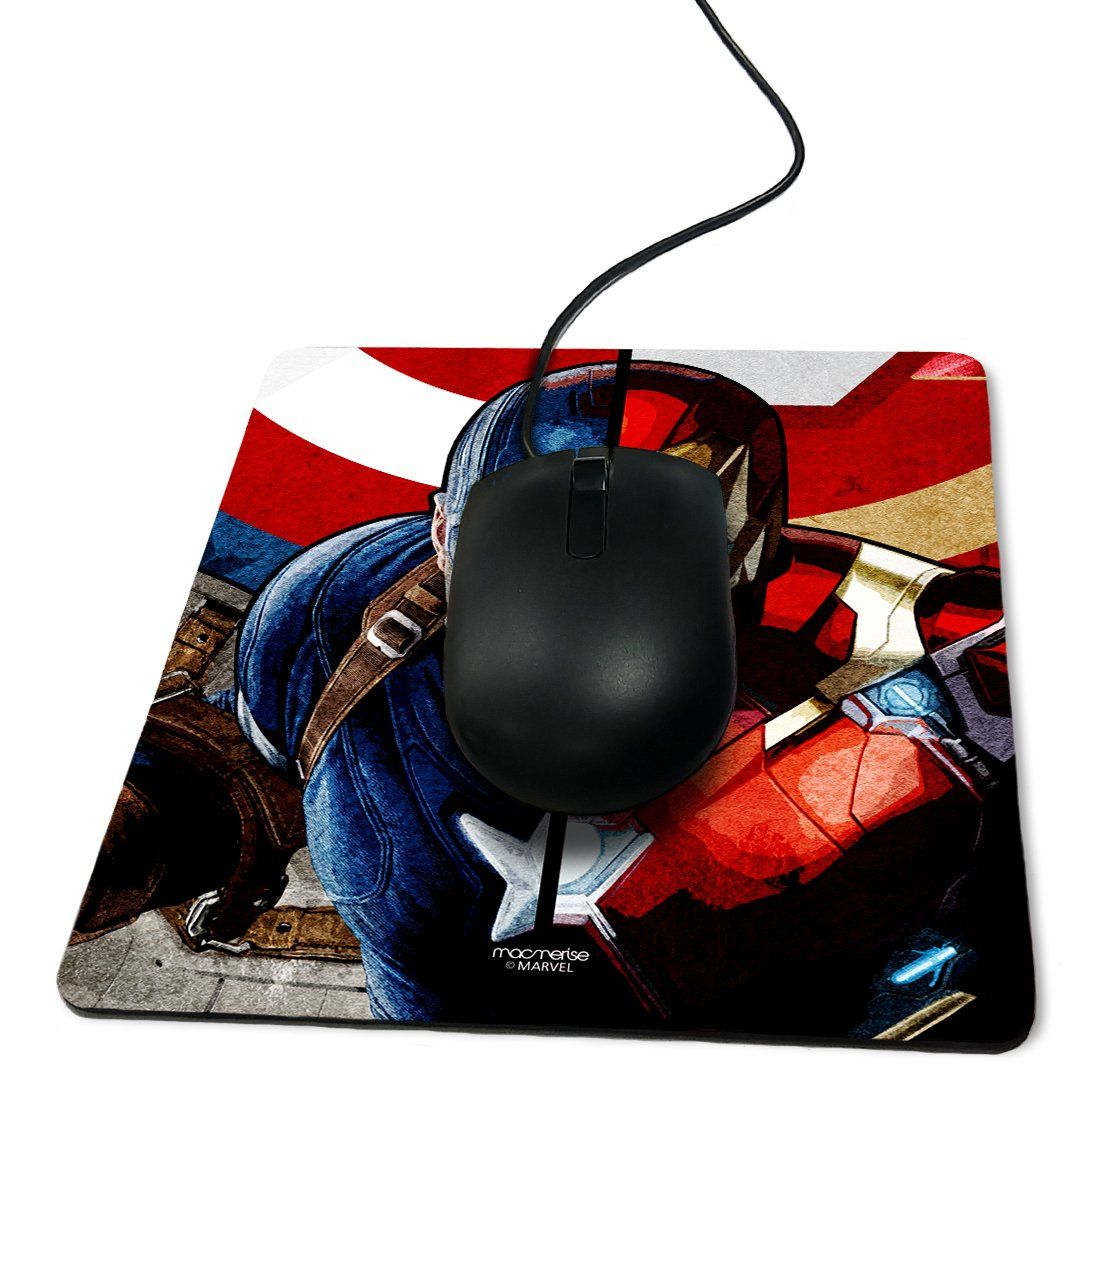 Man vs Machine - Macmerise Mouse Pad